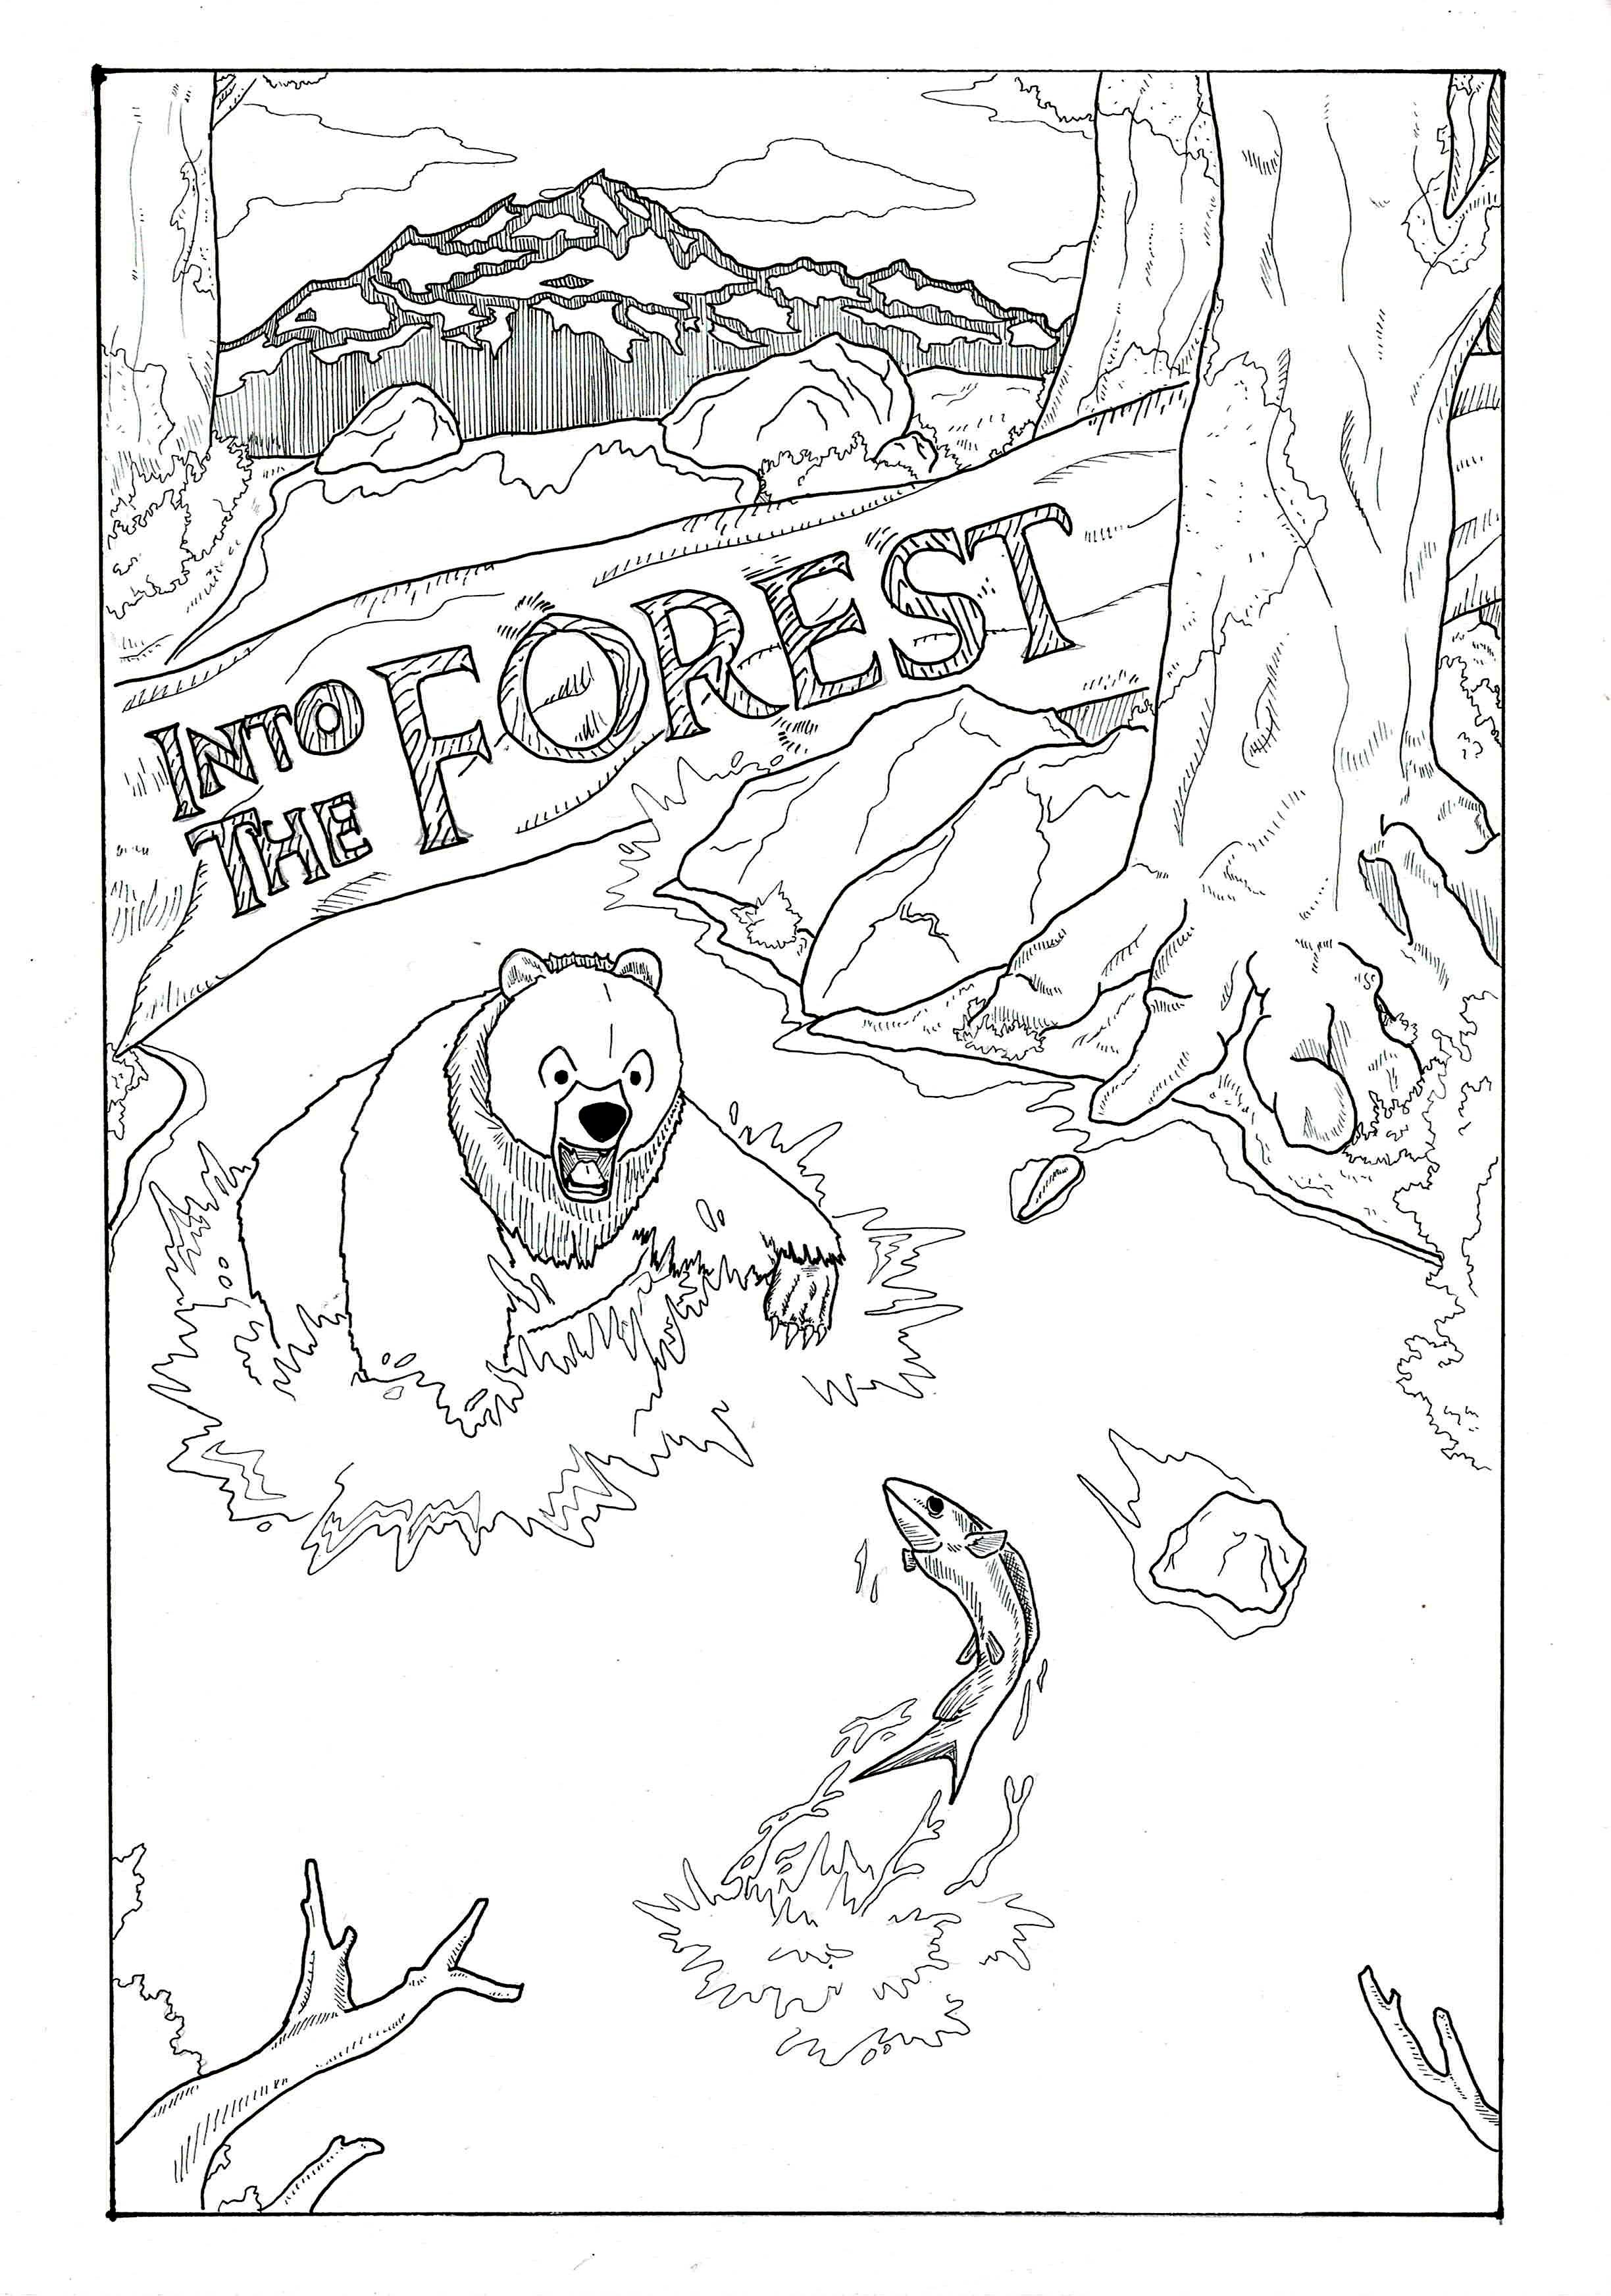 Into_Forest_Jaime_Muñoz_Martínez_01